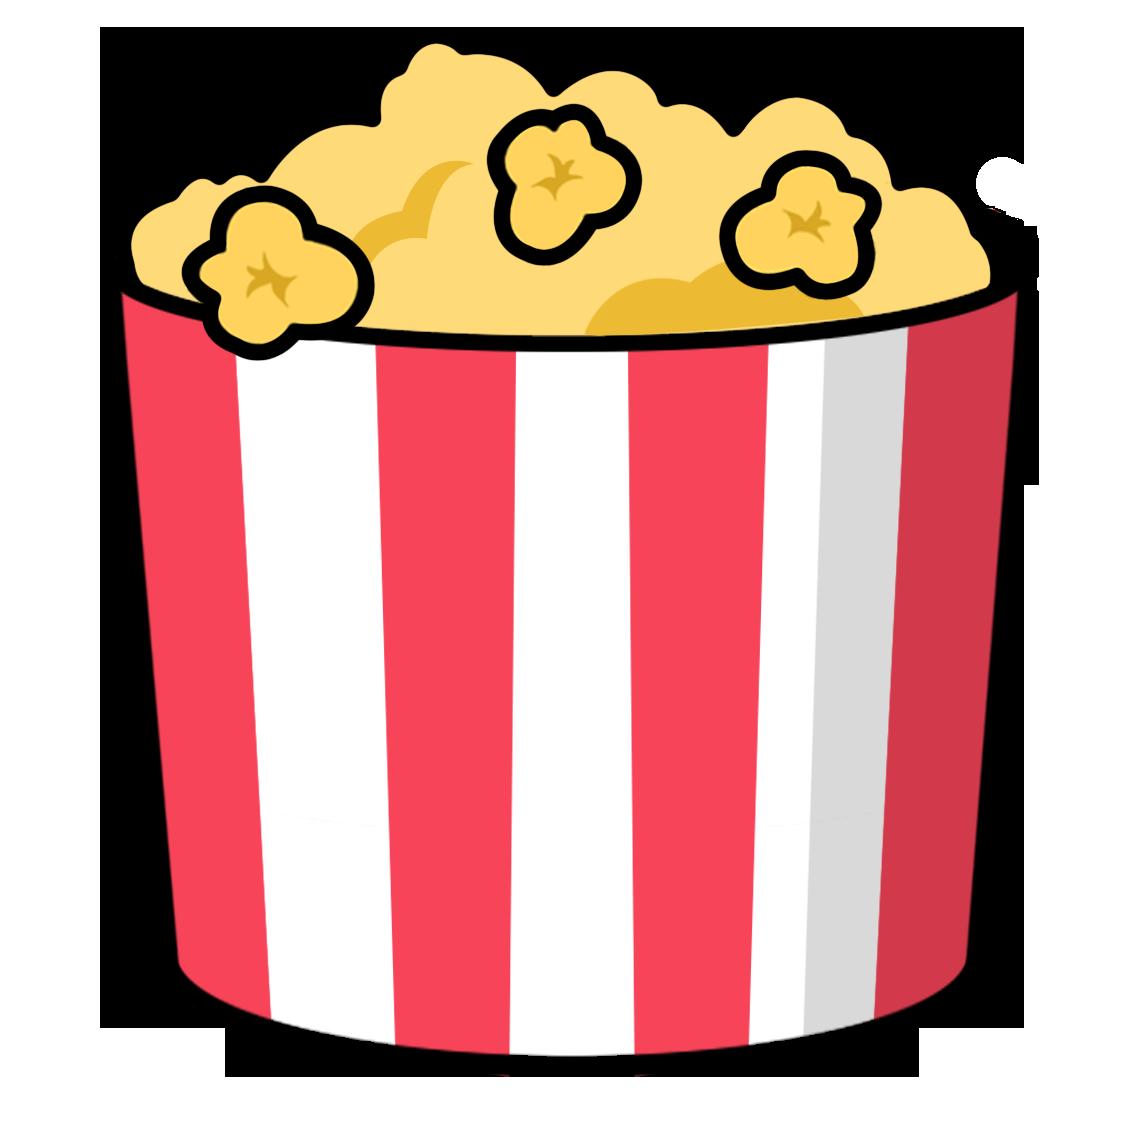 1123x1121 Free To Use Amp Popcorn Clip Art 4